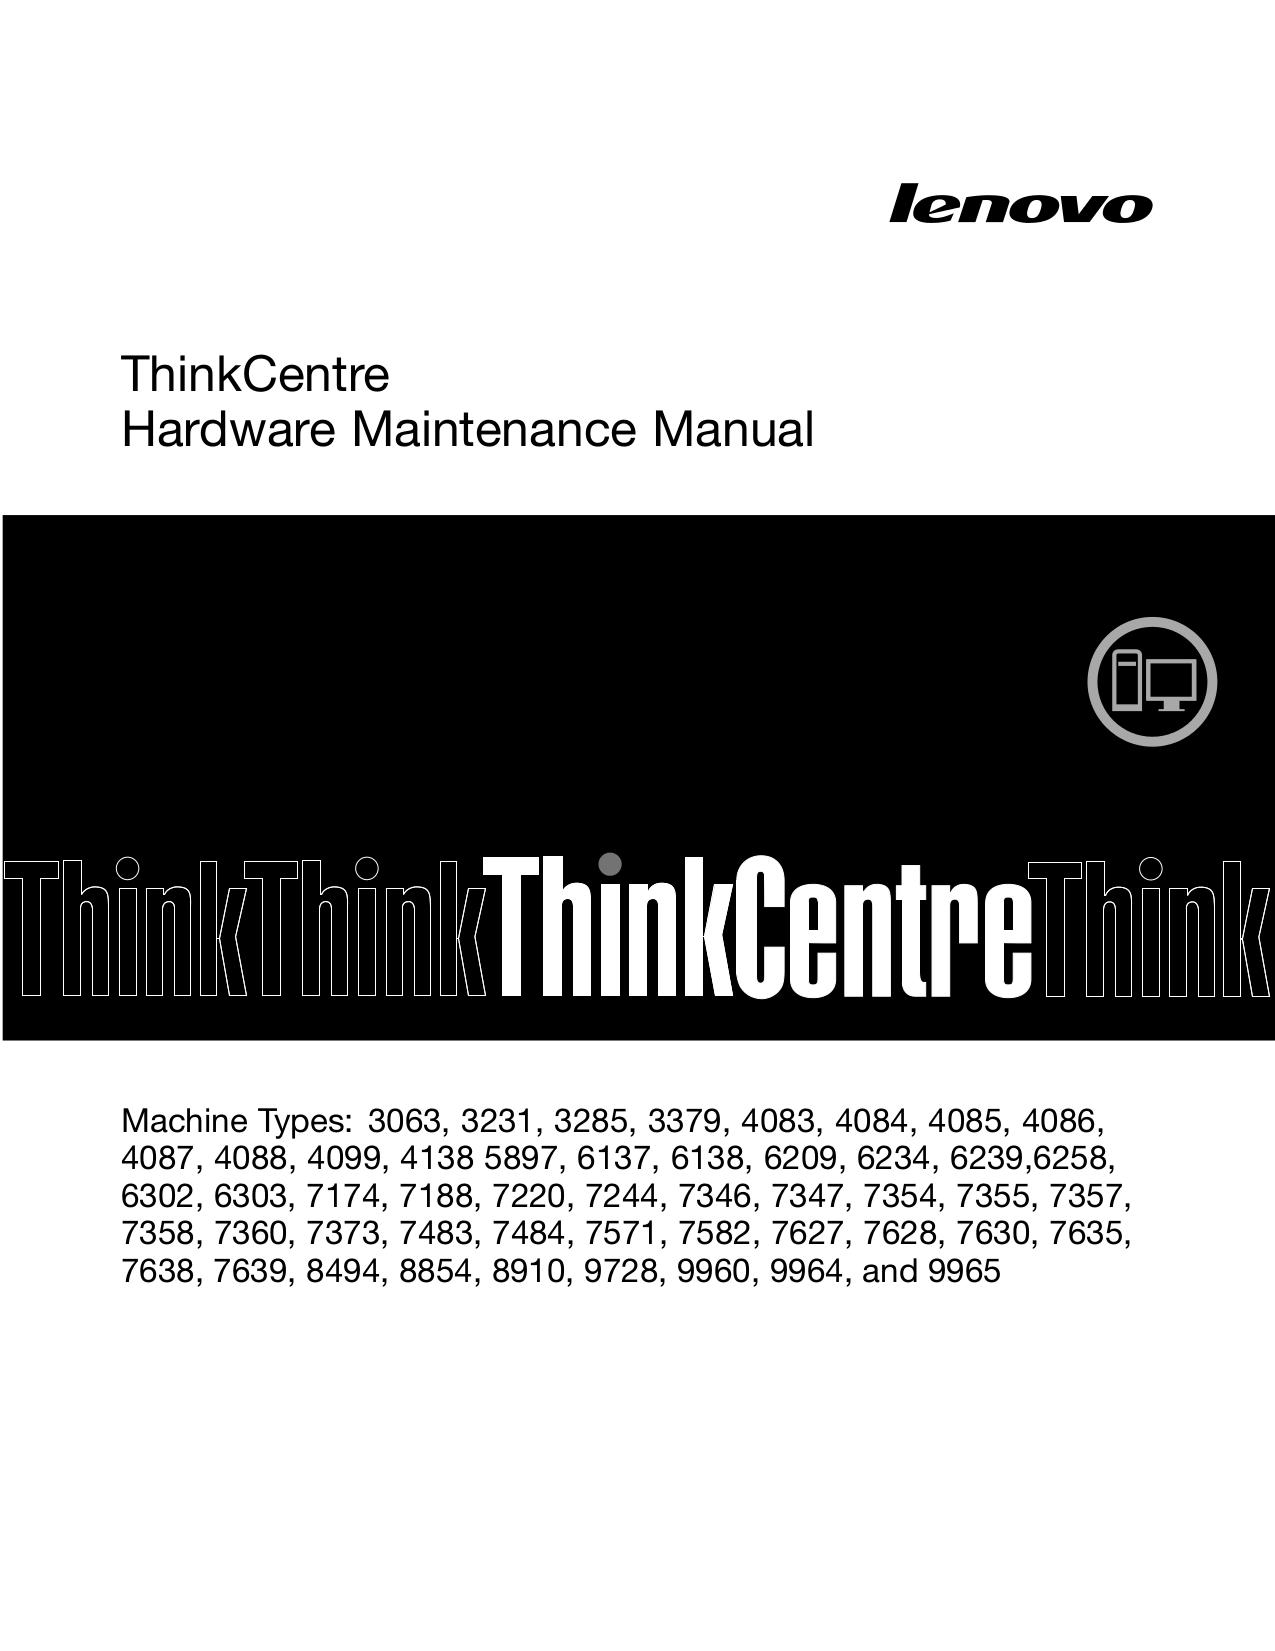 pdf for Lenovo Desktop ThinkCentre M58p 3285 manual